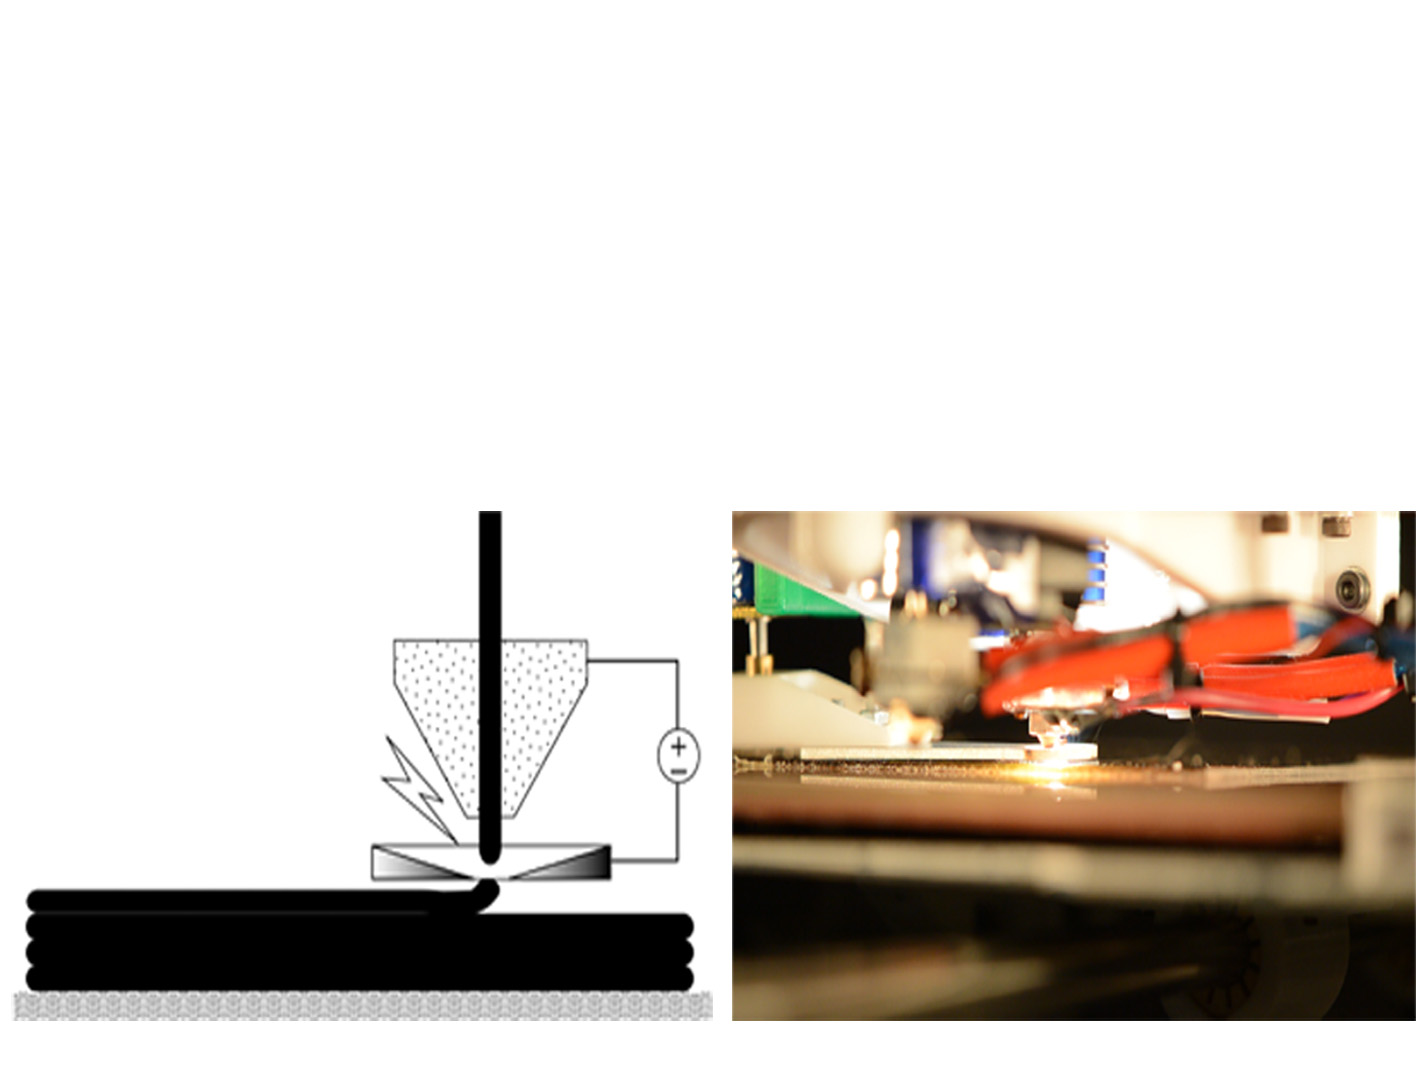 Method and apparatus for cutting nanotube filaments in a 3D Printer. Image credit: NASA